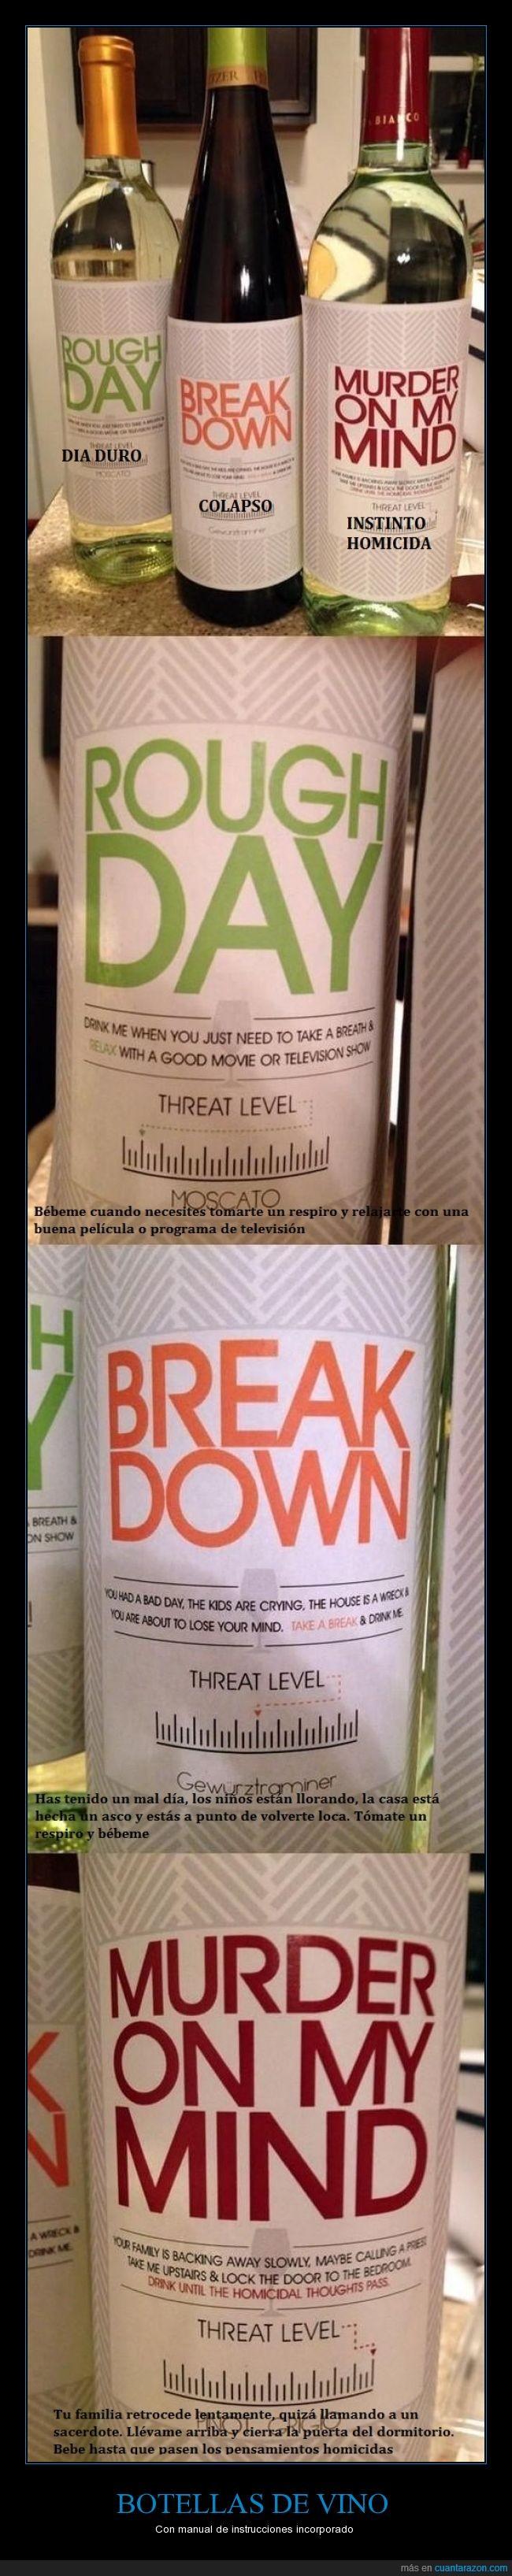 botella,etiqueta,instrucciones,vino